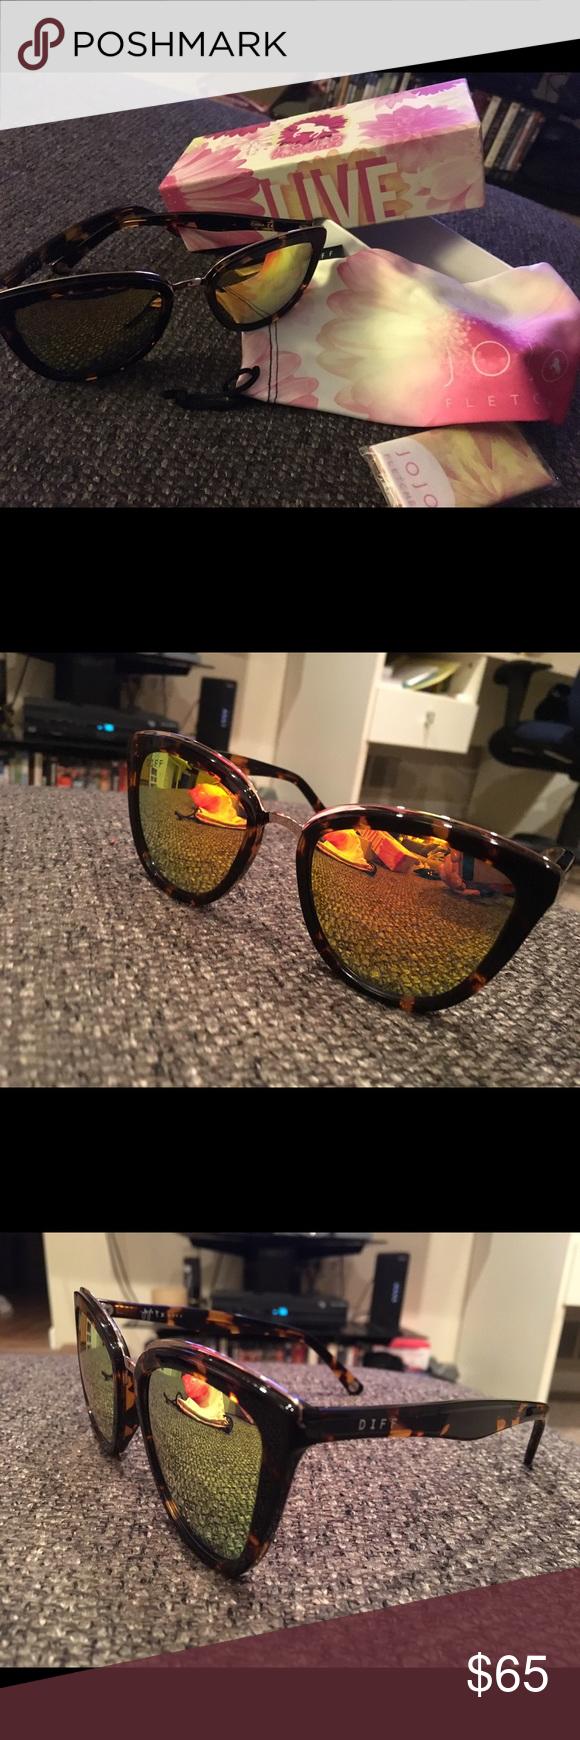 6a7046504eeb7 DIFF Eyewear JOJO Sunglasses JOJO Fletcher limited edition DIFF sunglasses.  Tortoise frame